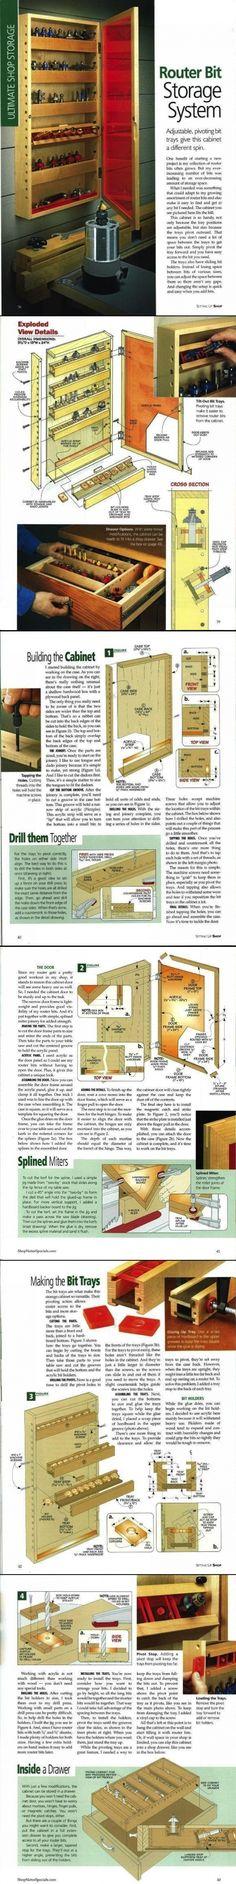 Router Bit Storage System - ShopNotes Magazine / Setting Up Shop 2009